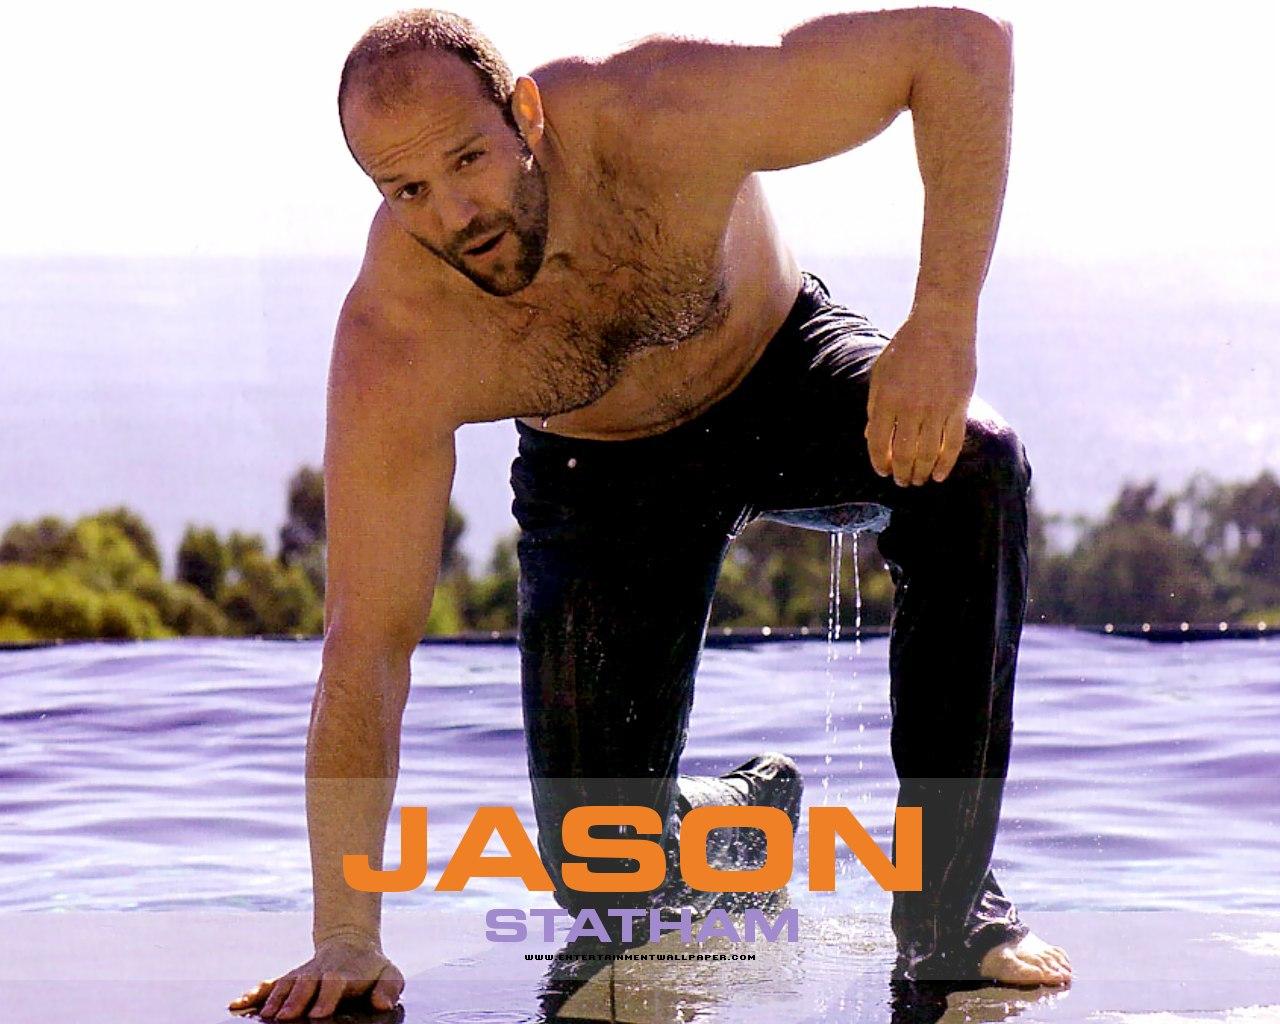 http://2.bp.blogspot.com/-jw32OWHzbvs/TY8MaGPE7rI/AAAAAAAAQSc/WNswbSr5Qw8/s1600/Jason-Statham--jason-statham-645155_1280_1024.jpg